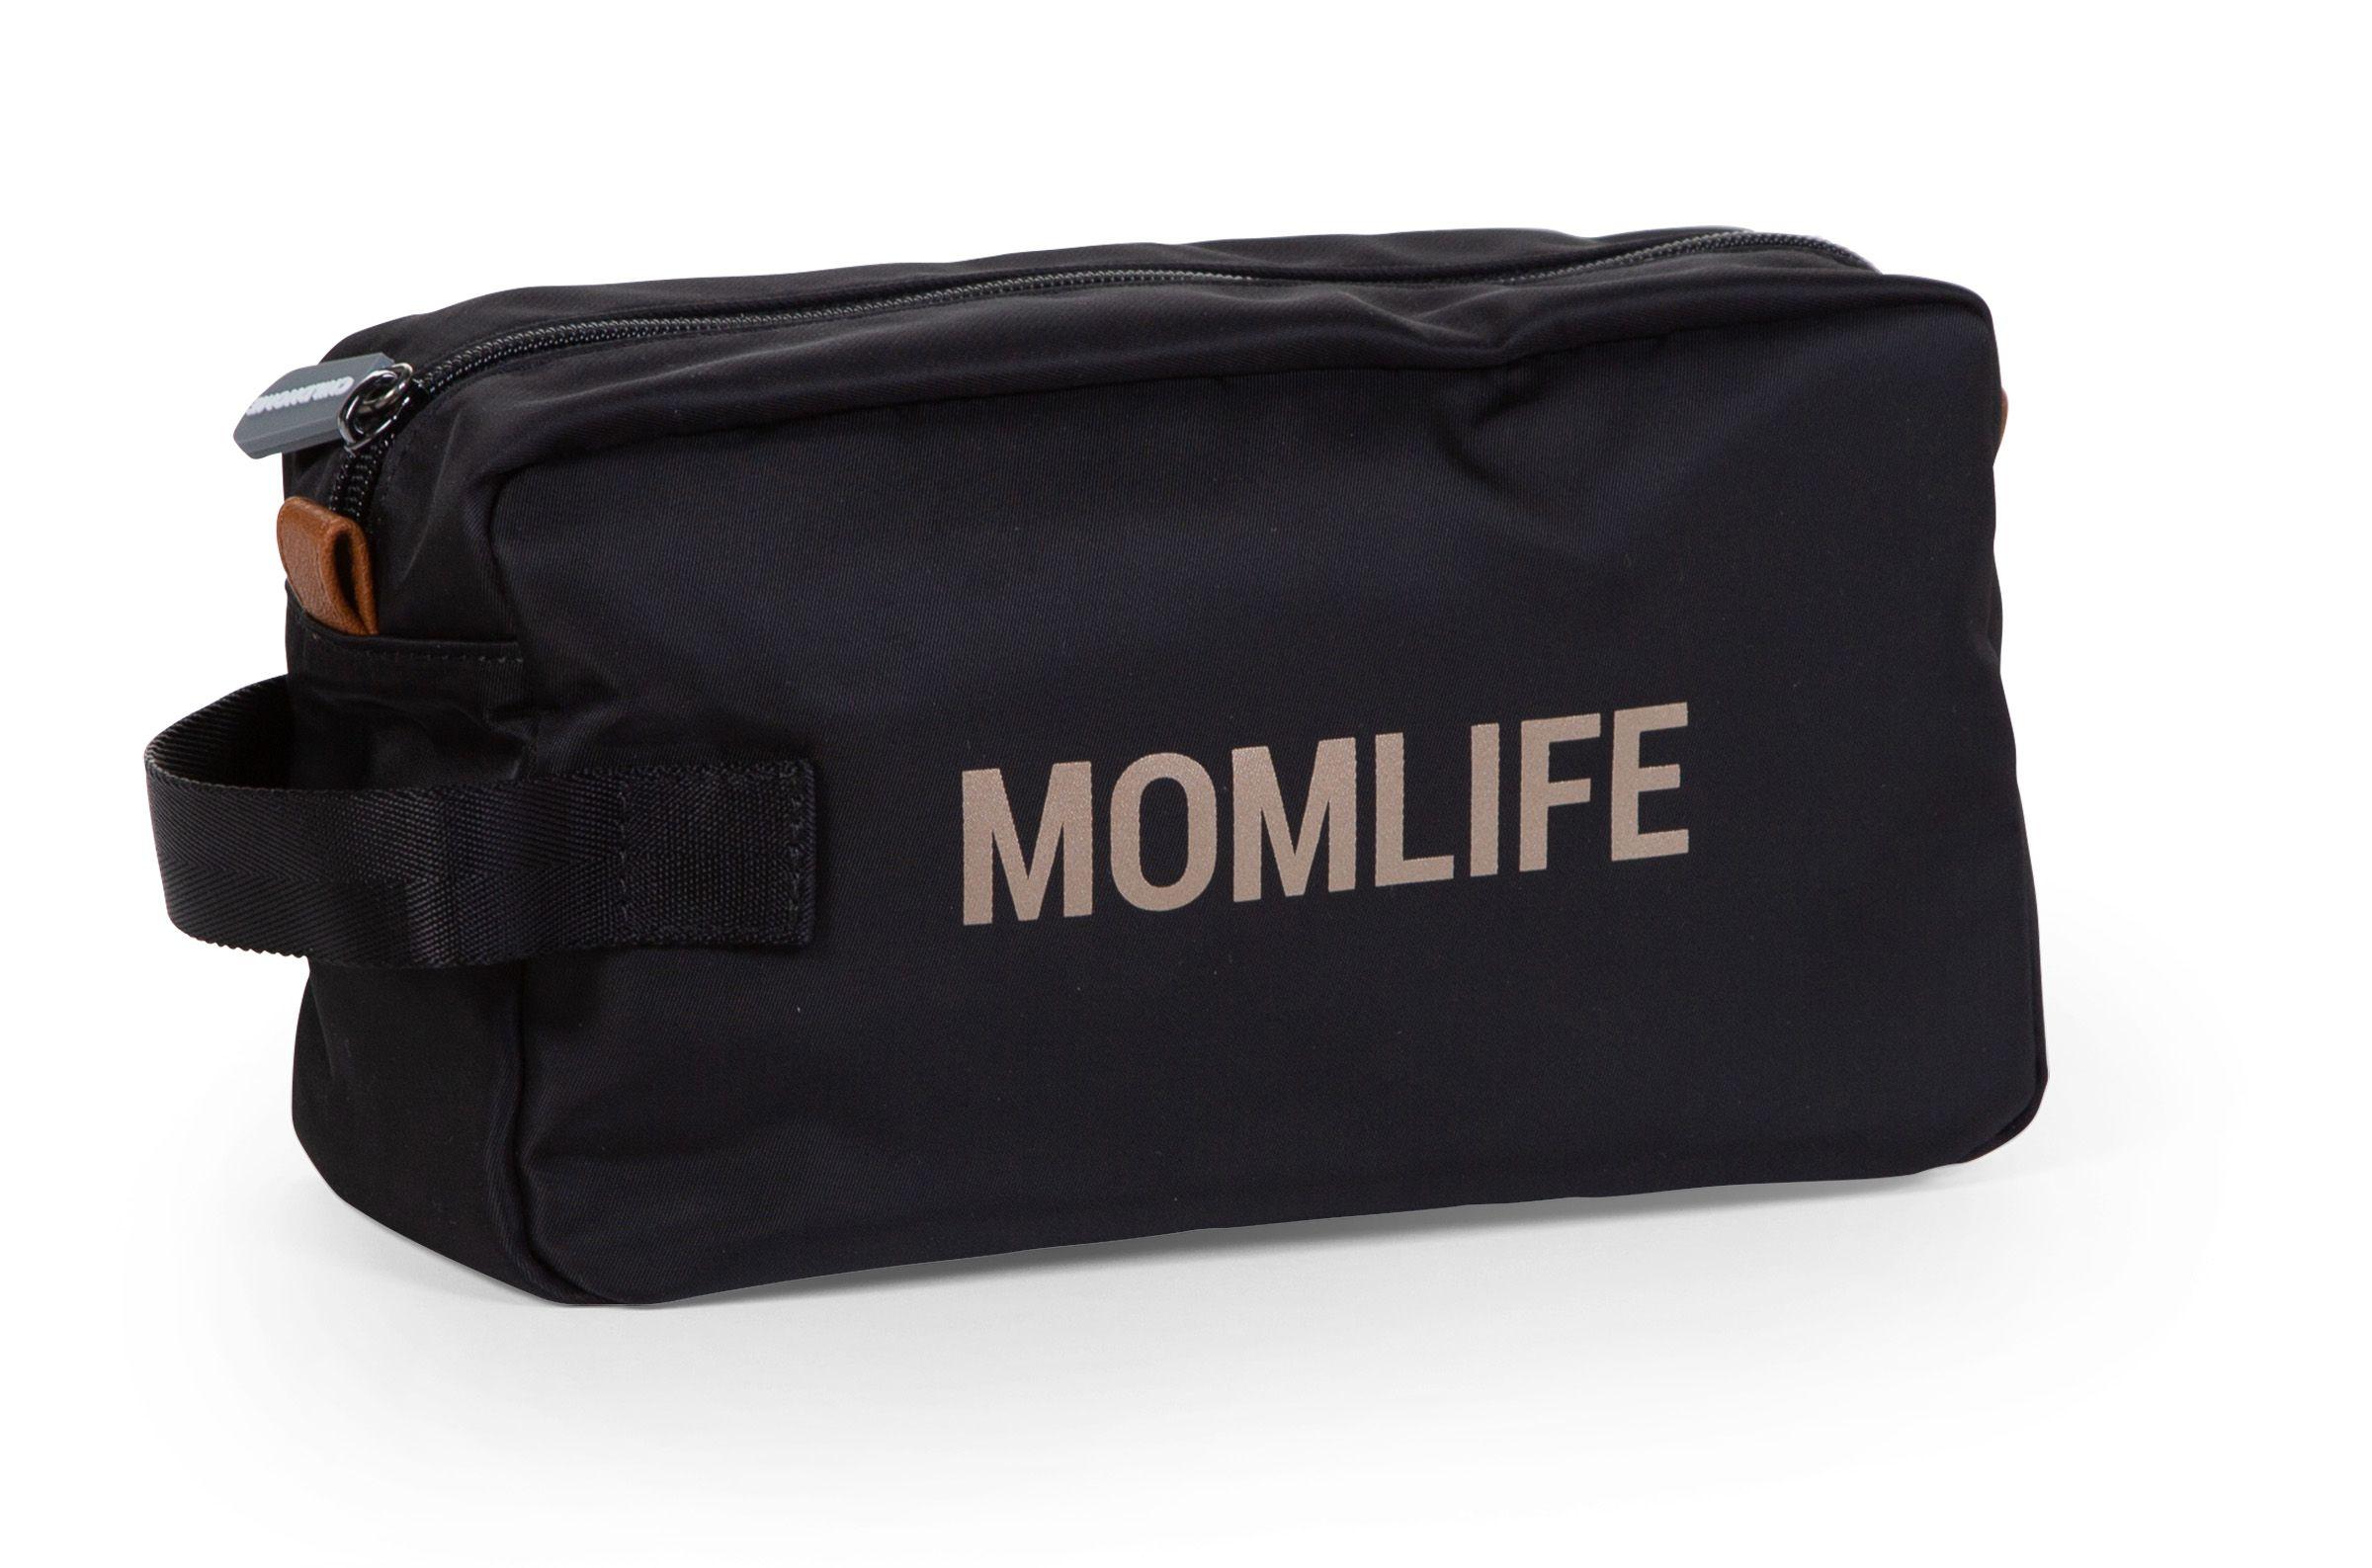 Toaletná taška Momlife Black Gold